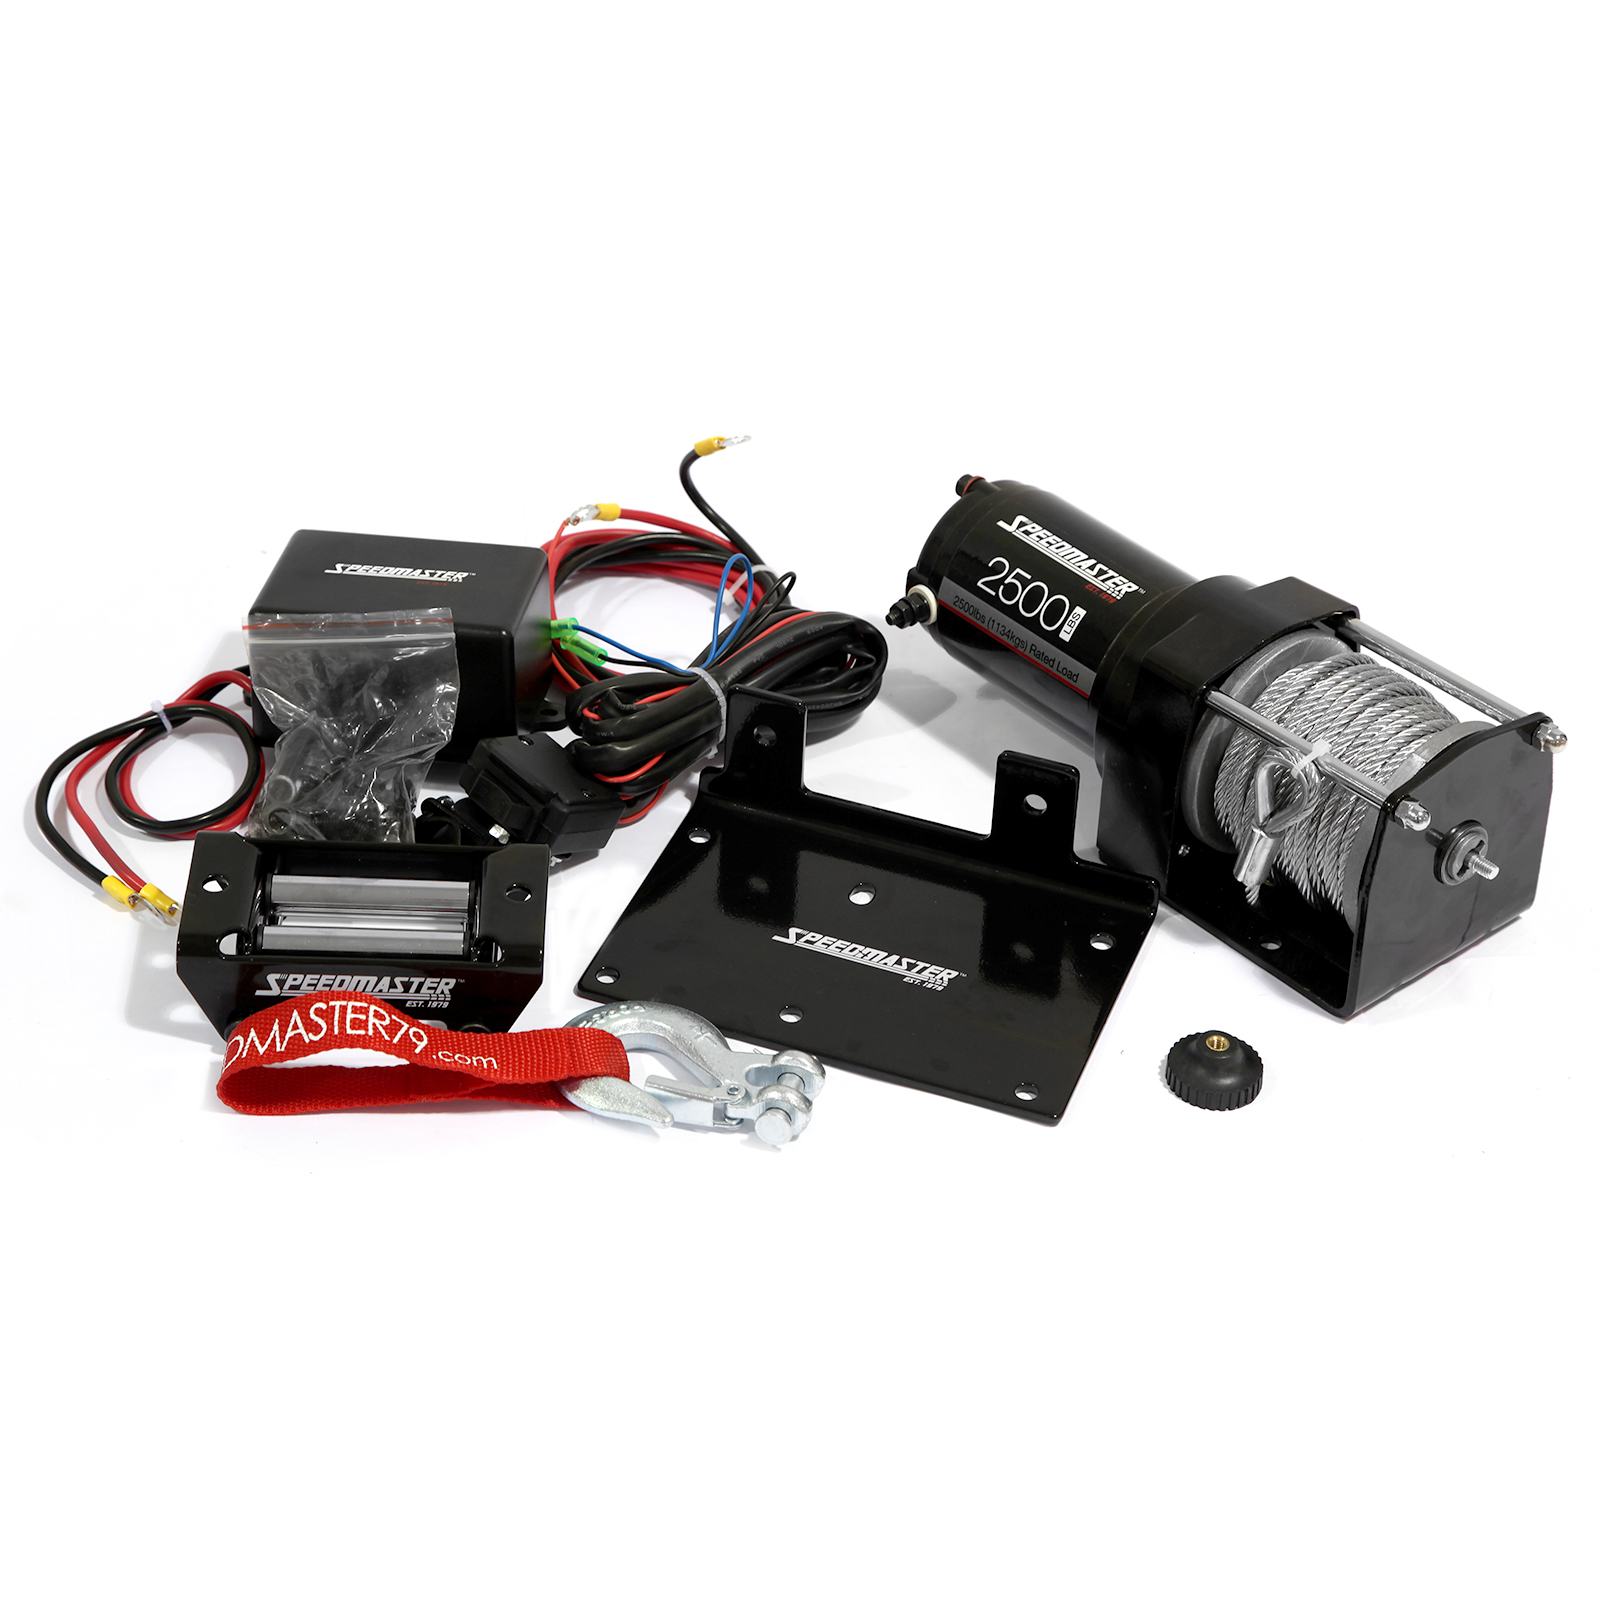 Speedmaster 2500lbs / 1130kgs 12V Electric ATV Winch Kit w/ Remote Switch